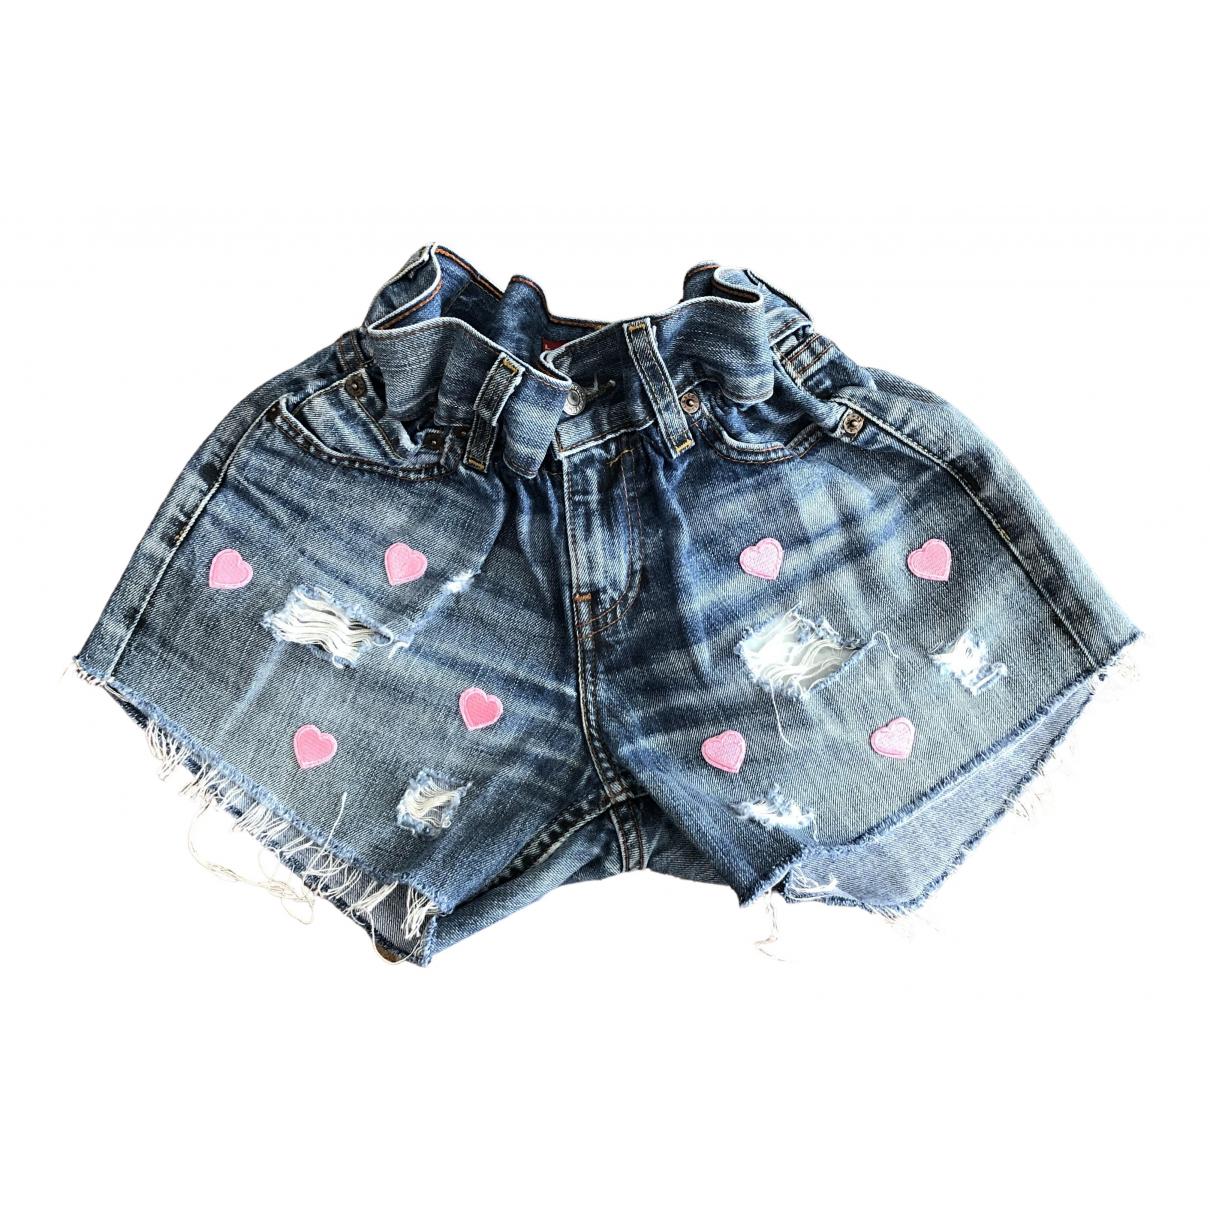 Levi's Vintage Clothing \N Denim - Jeans Shorts for Women XS International